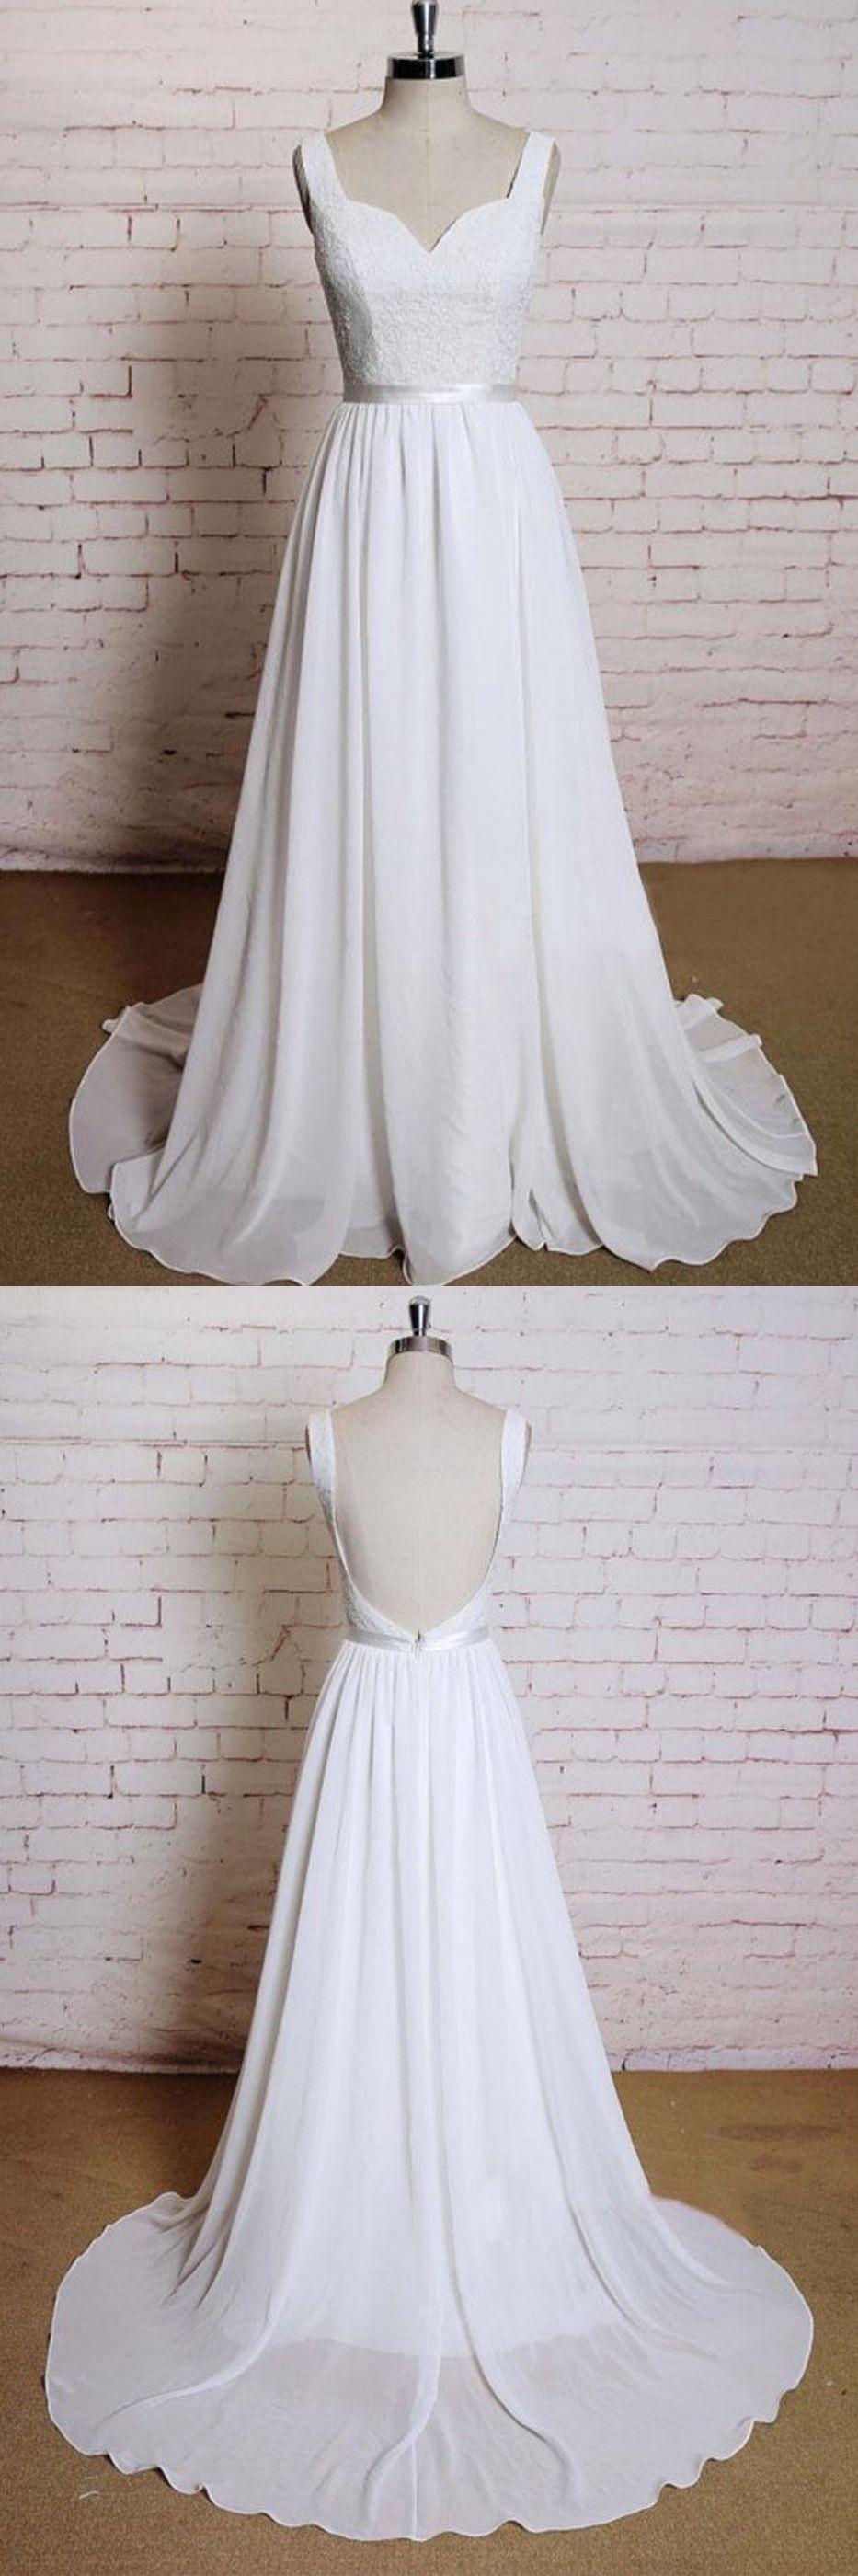 Simple a line chiffon wedding dresses wd dreaming wedding